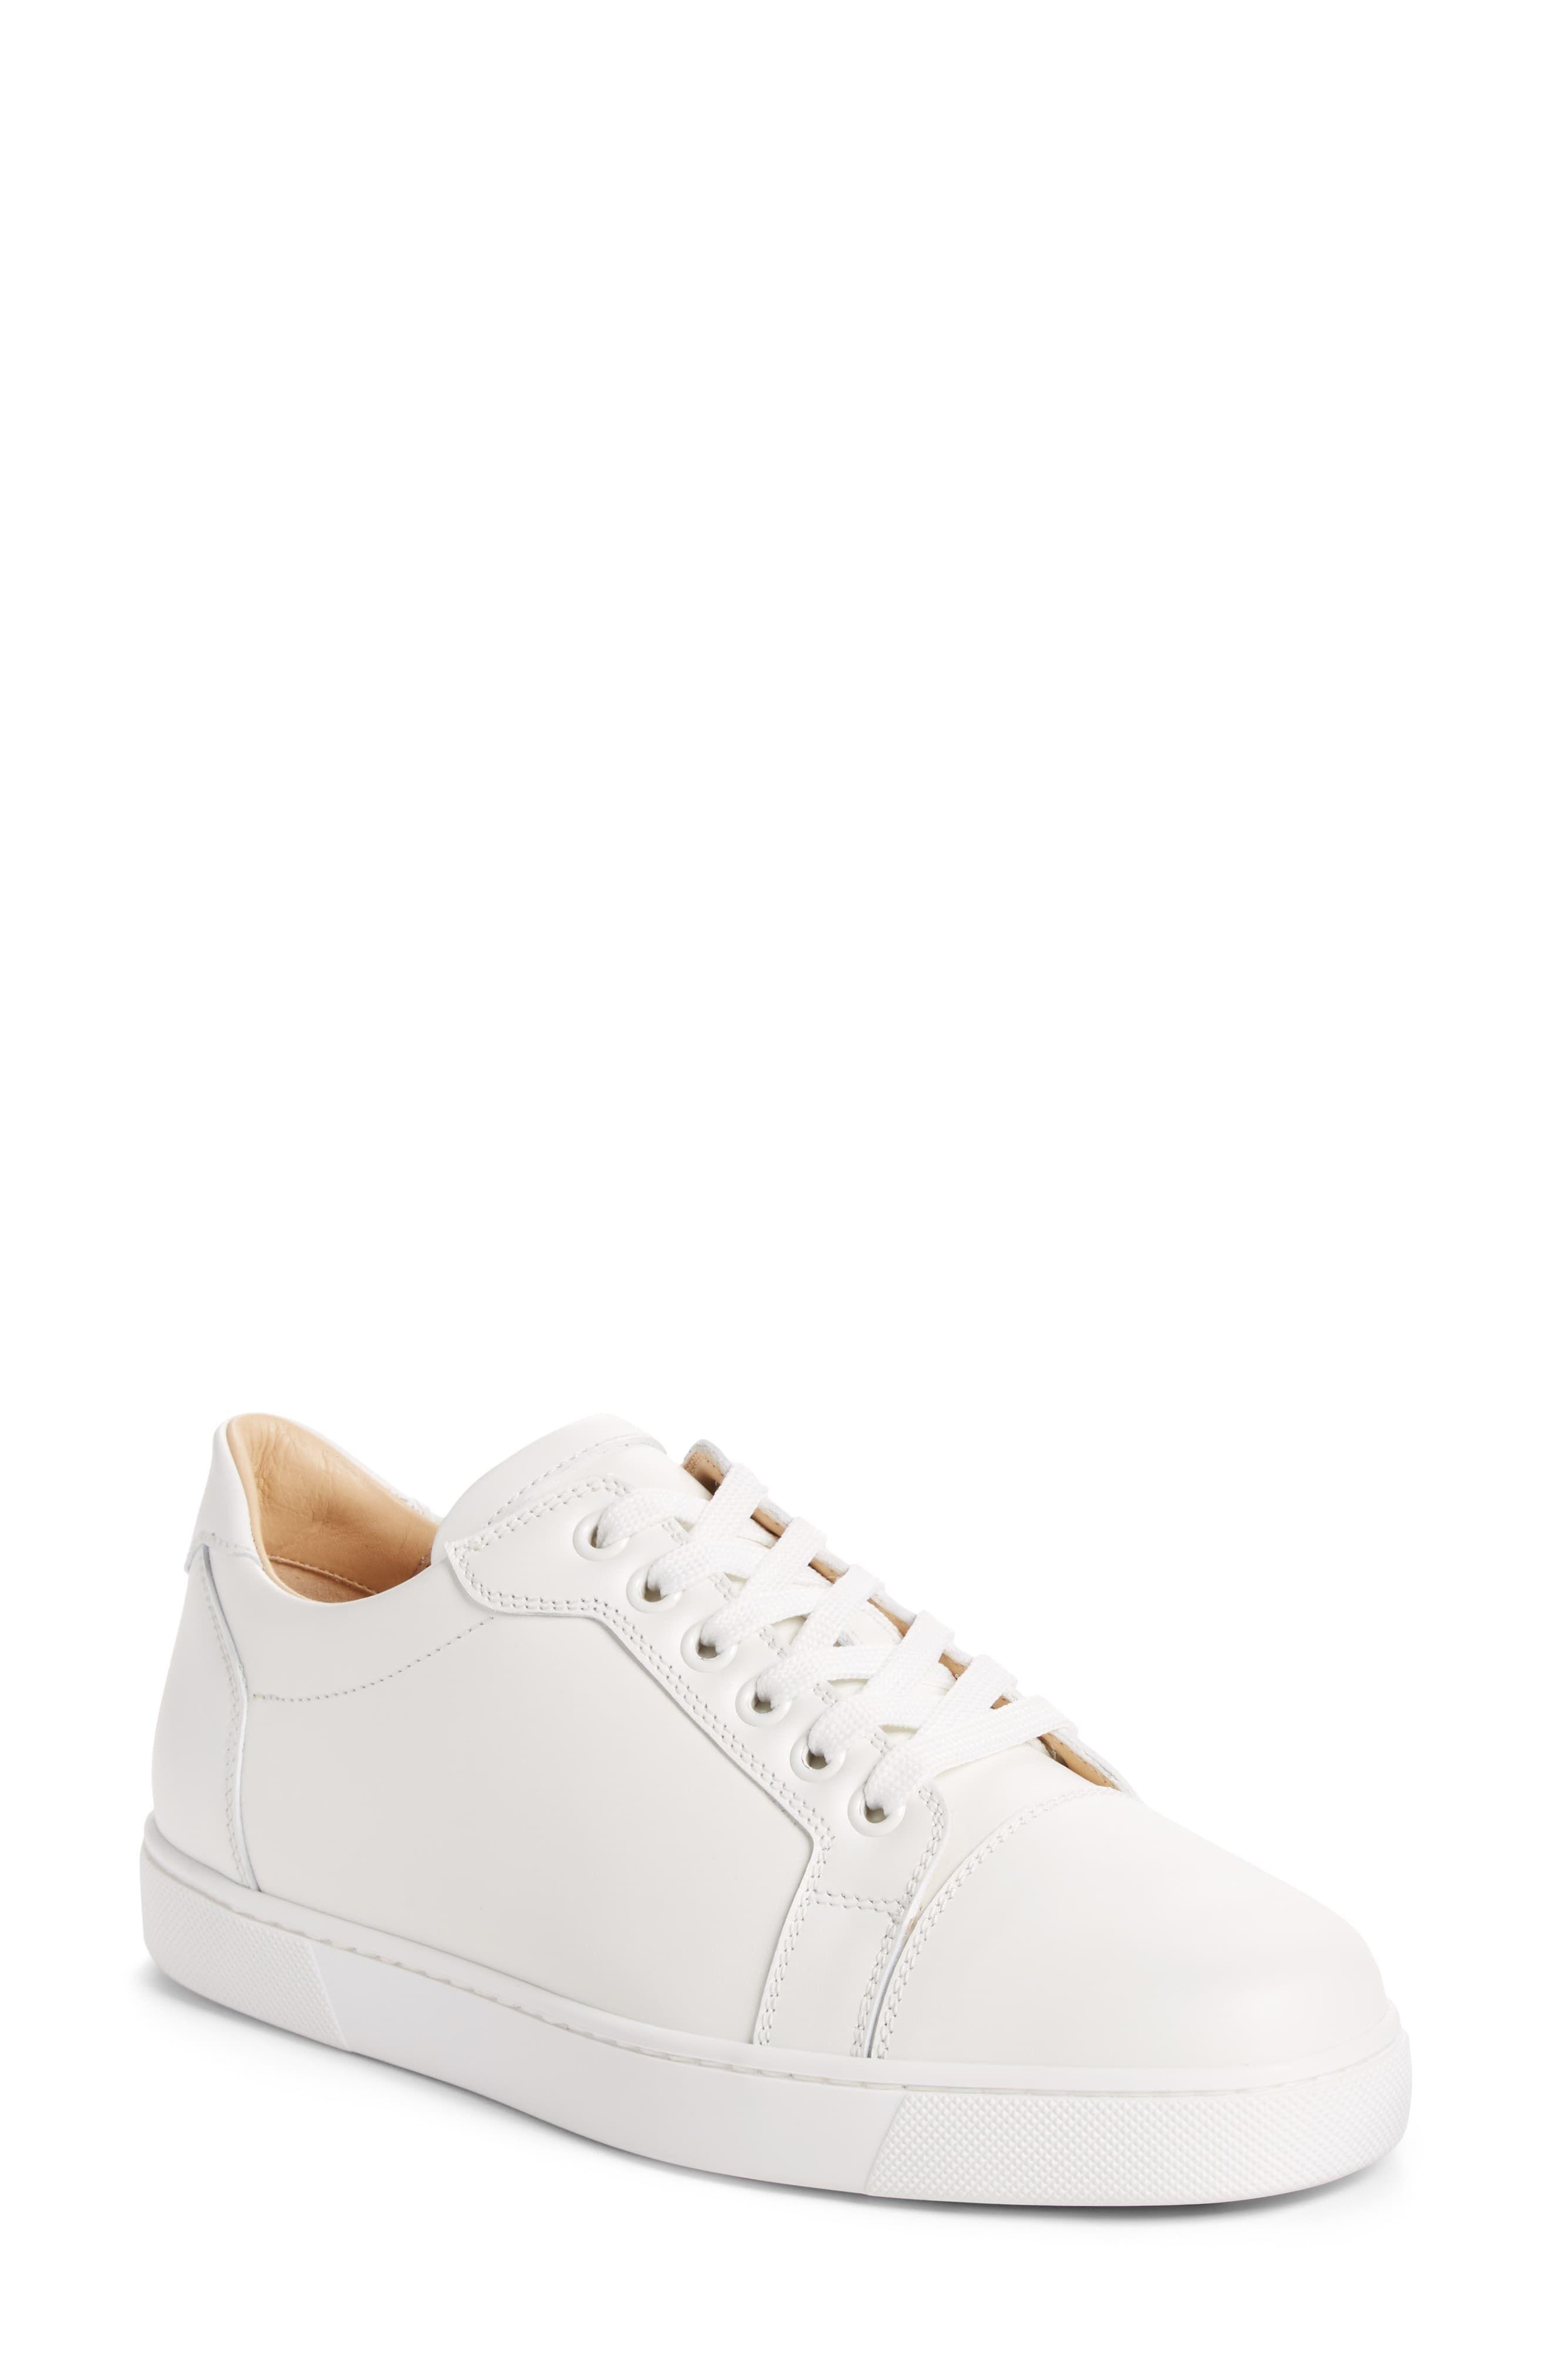 Women's Christian Louboutin Vieira Lace Up Sneaker, Size 5.5